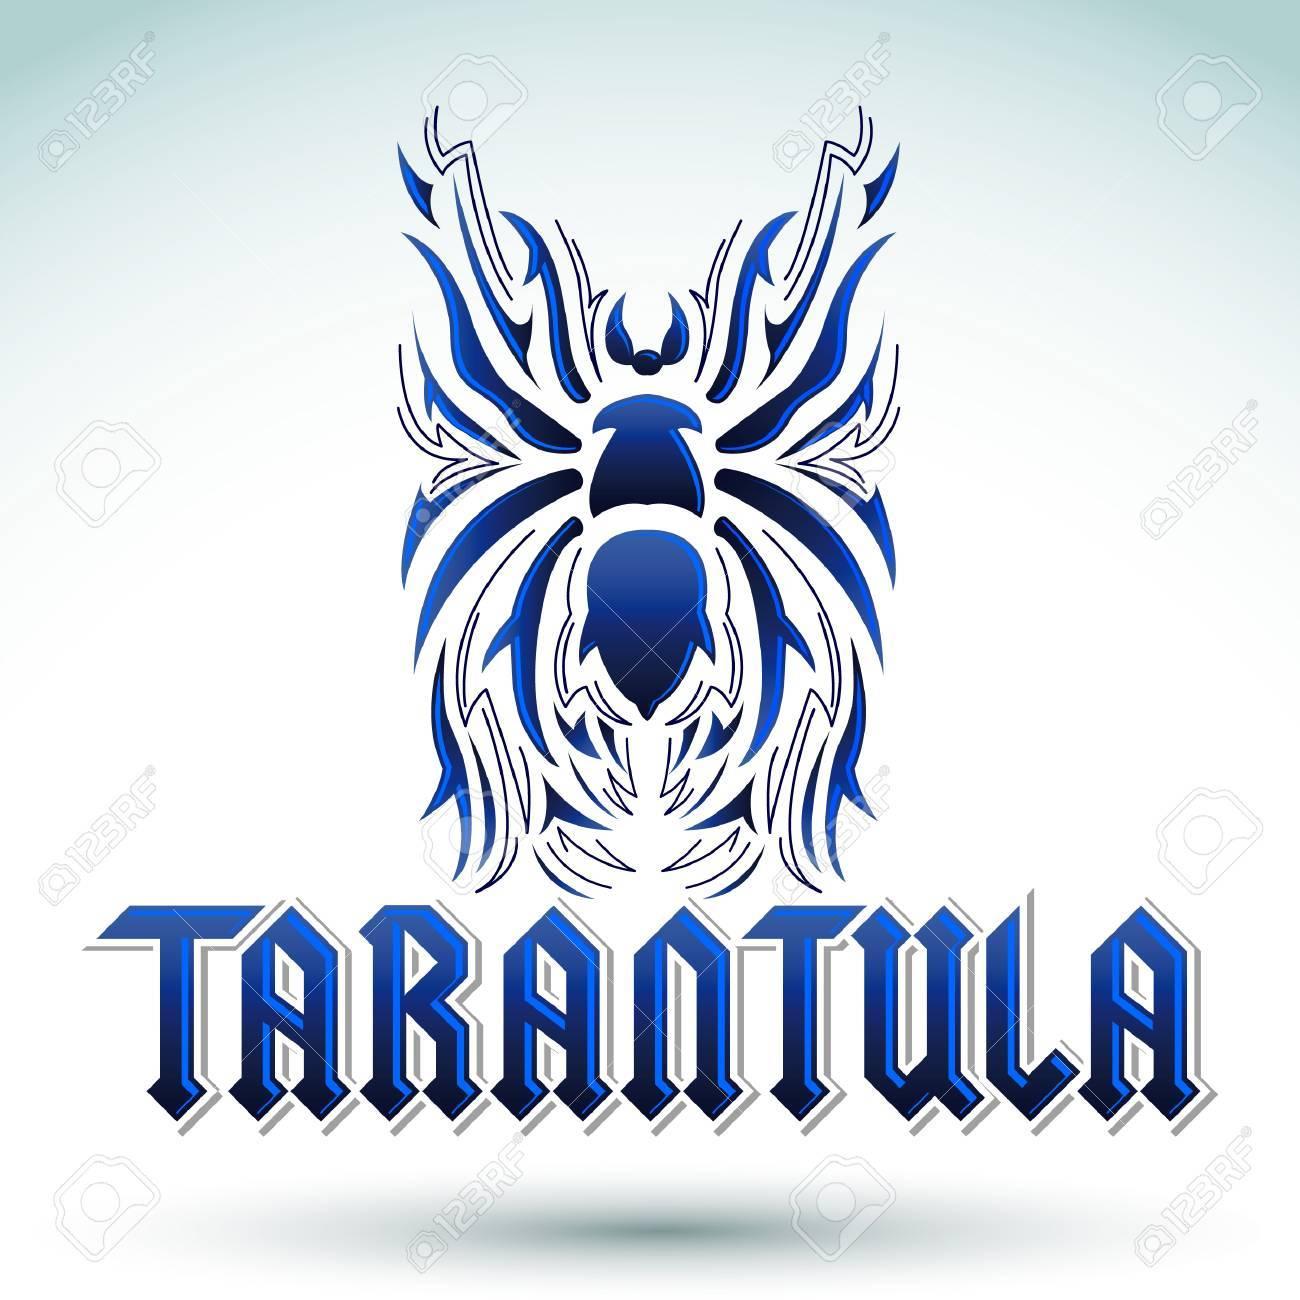 Tarantula Design Tarantula Lettering Design